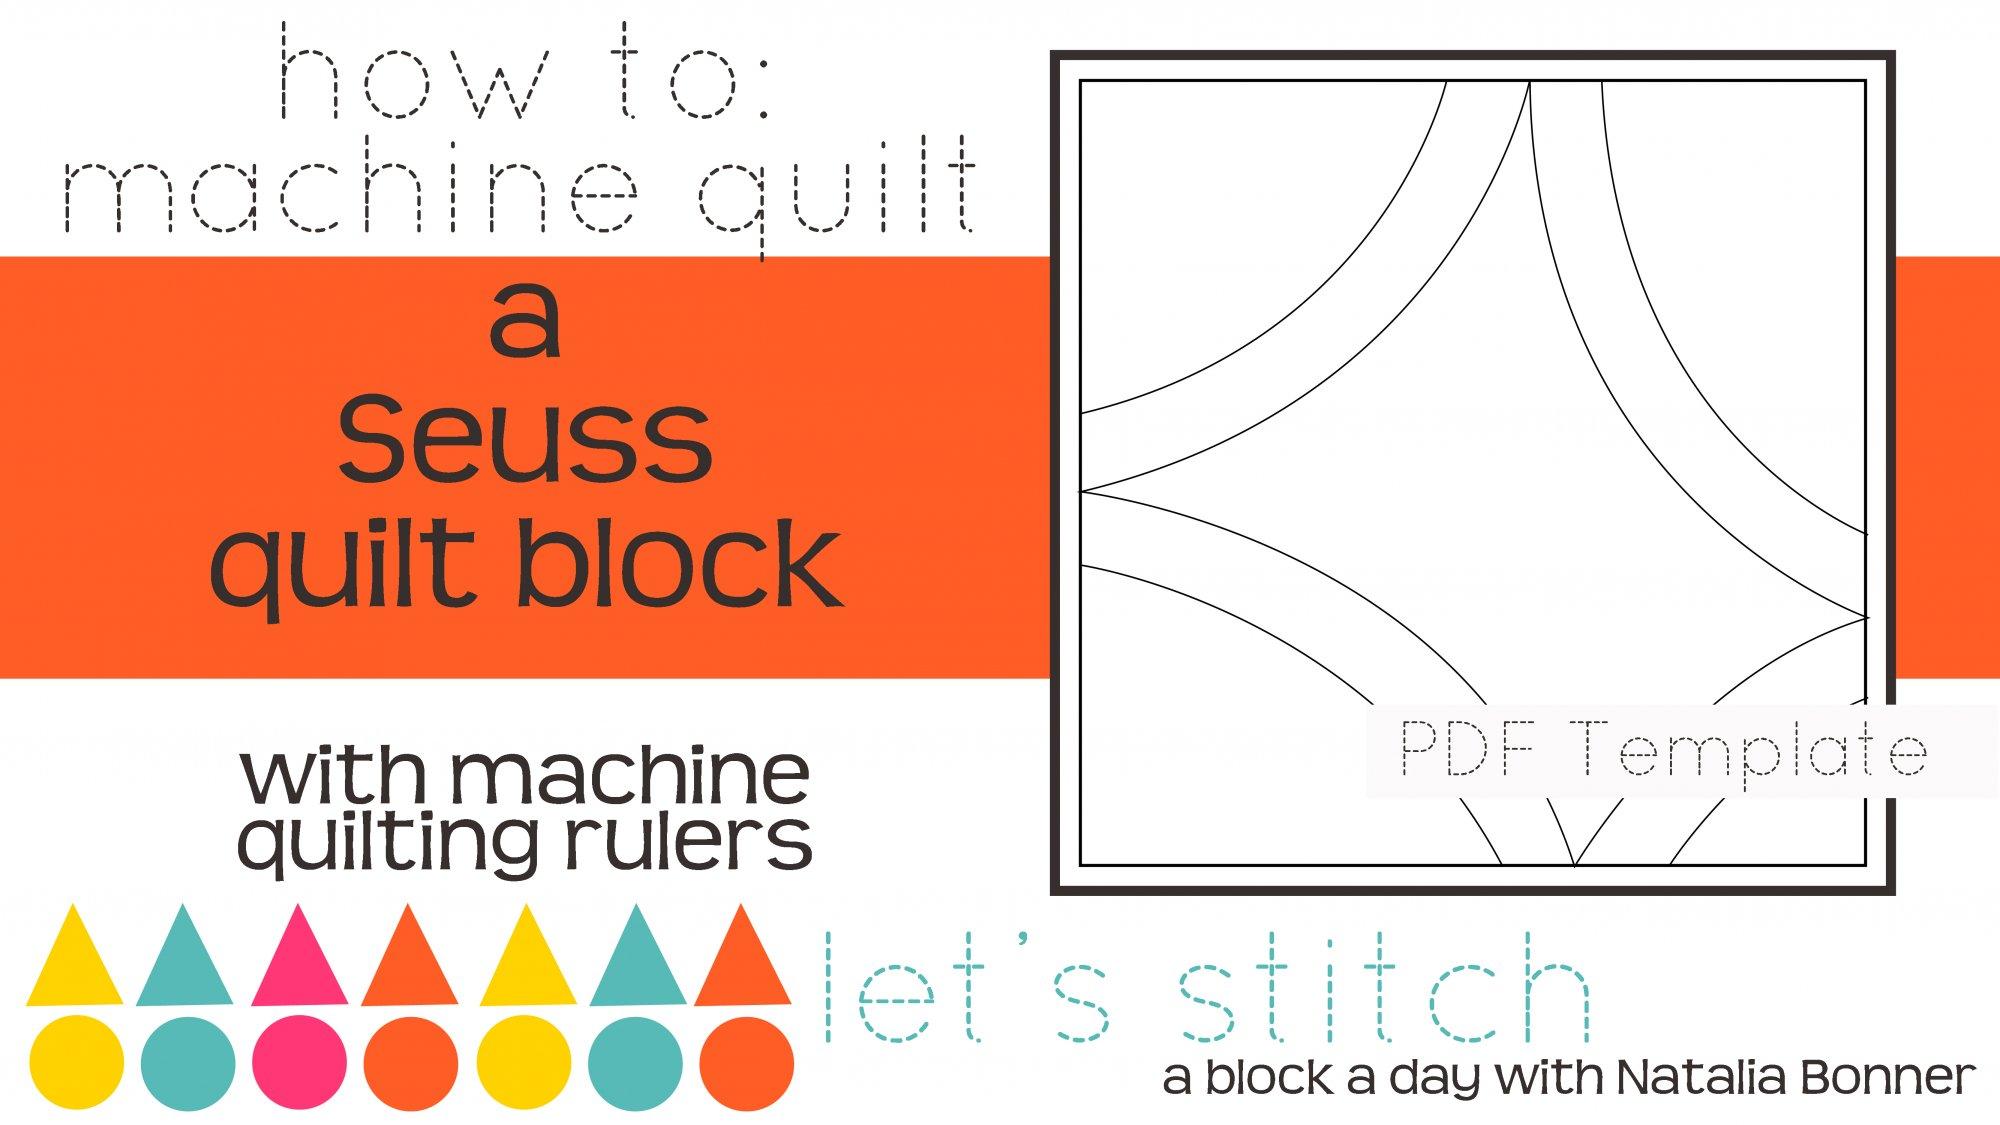 Let's Stitch - A Block a Day With Natalia Bonner - PDF - Seuss